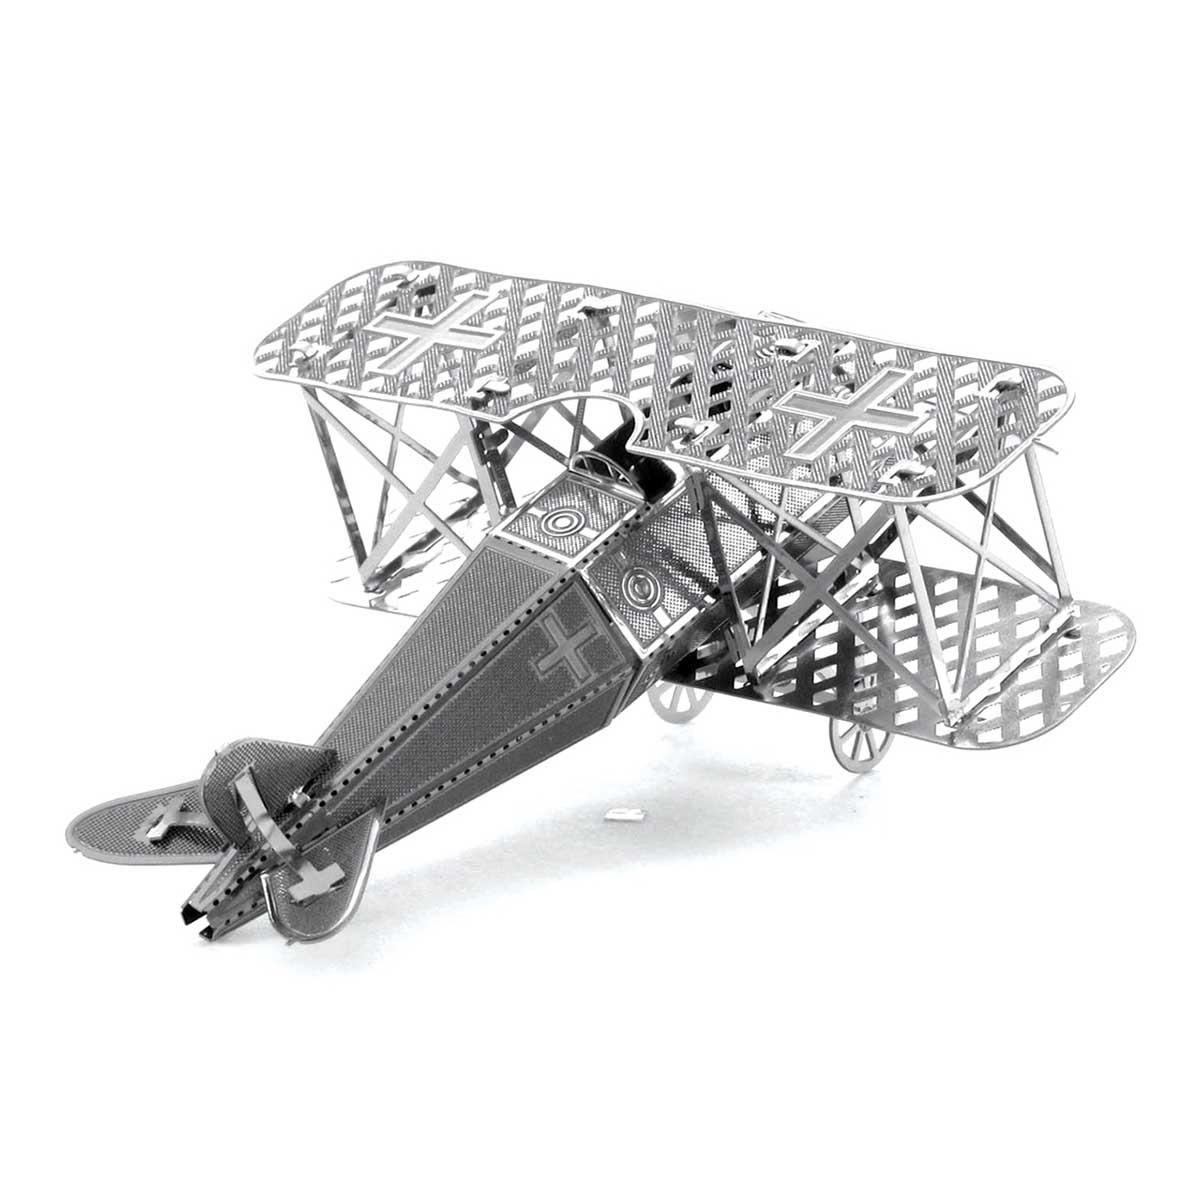 Fokker D-VII Planes Metal Puzzles